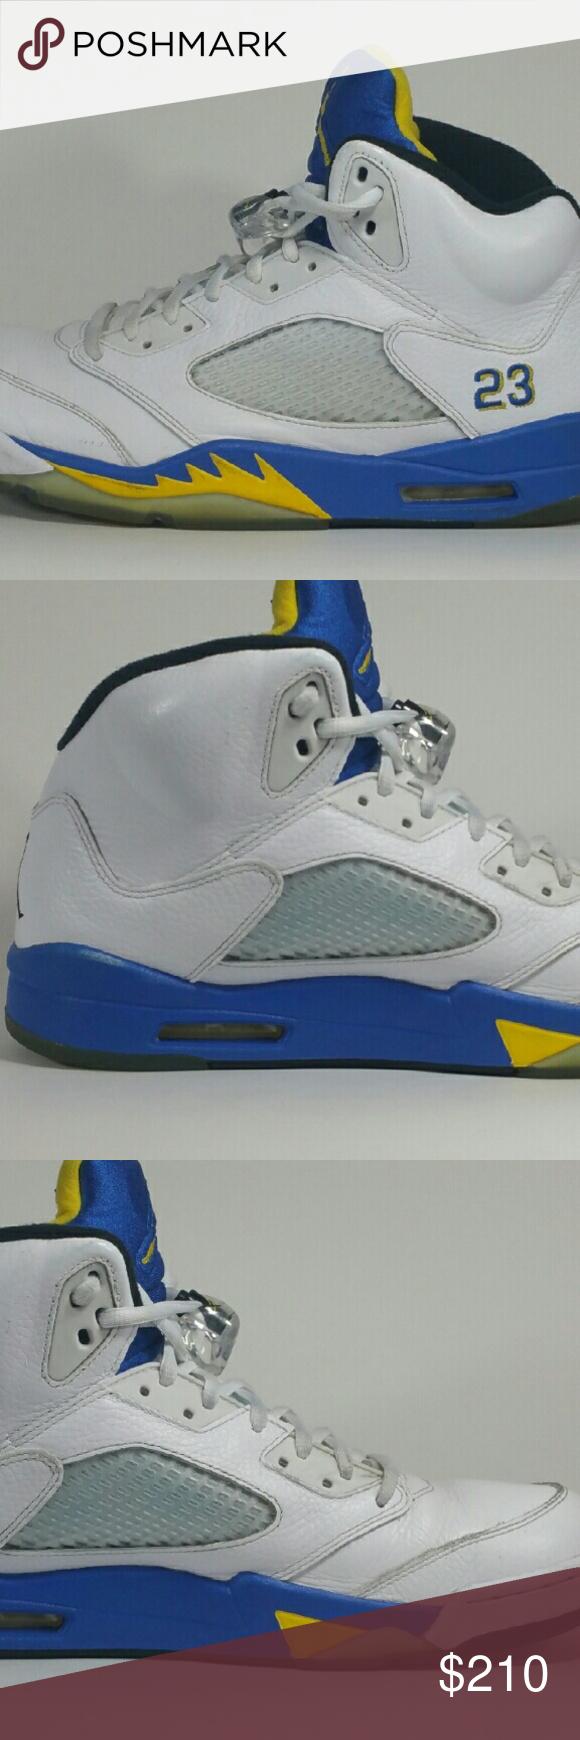 free shipping ec711 78683 Men s Air Jordan 5 Retro